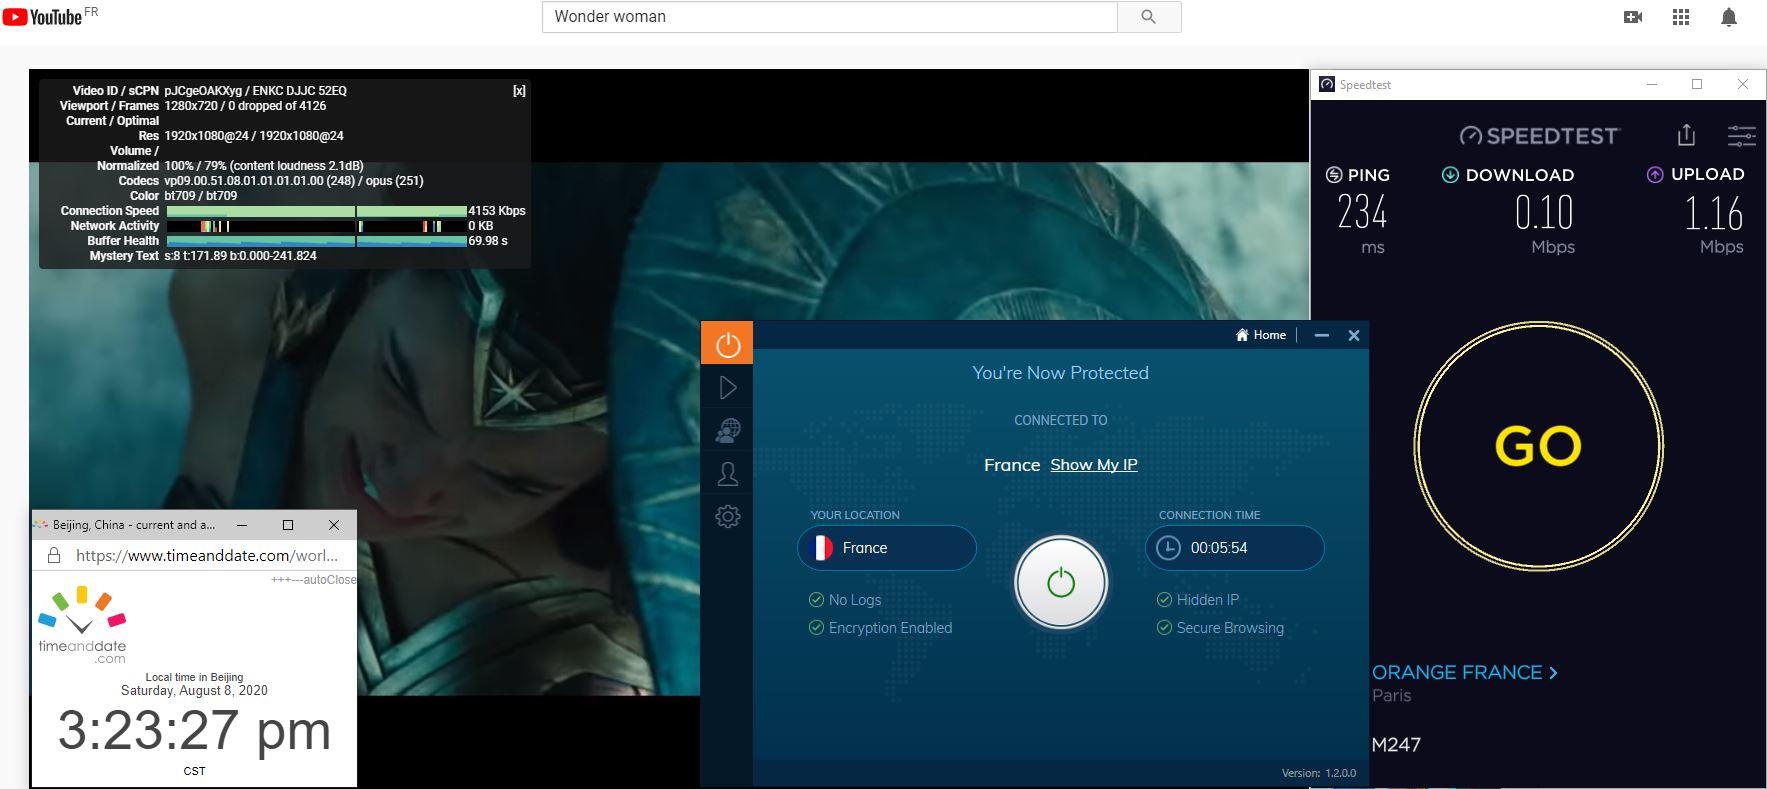 Windows10 IvacyVPN-Prime版本 France 中国VPN 翻墙 科学上网 翻墙速度测试 - 20200808